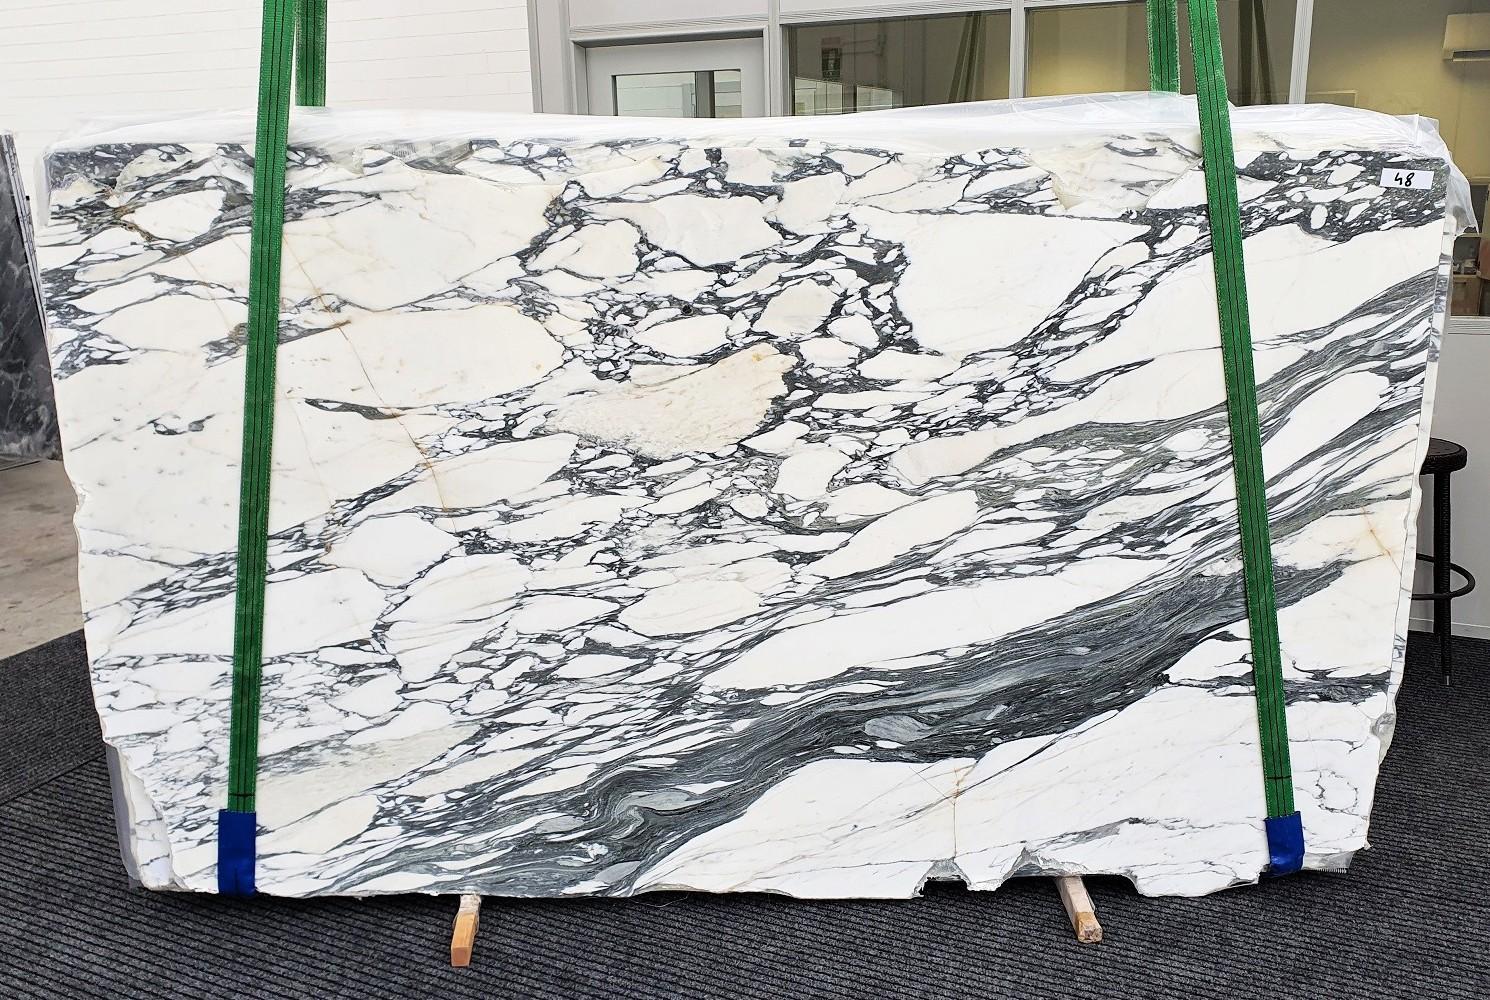 ARABESCATO CORCHIA Supply Veneto (Italy) polished slabs 1323 , Slab #48 natural marble